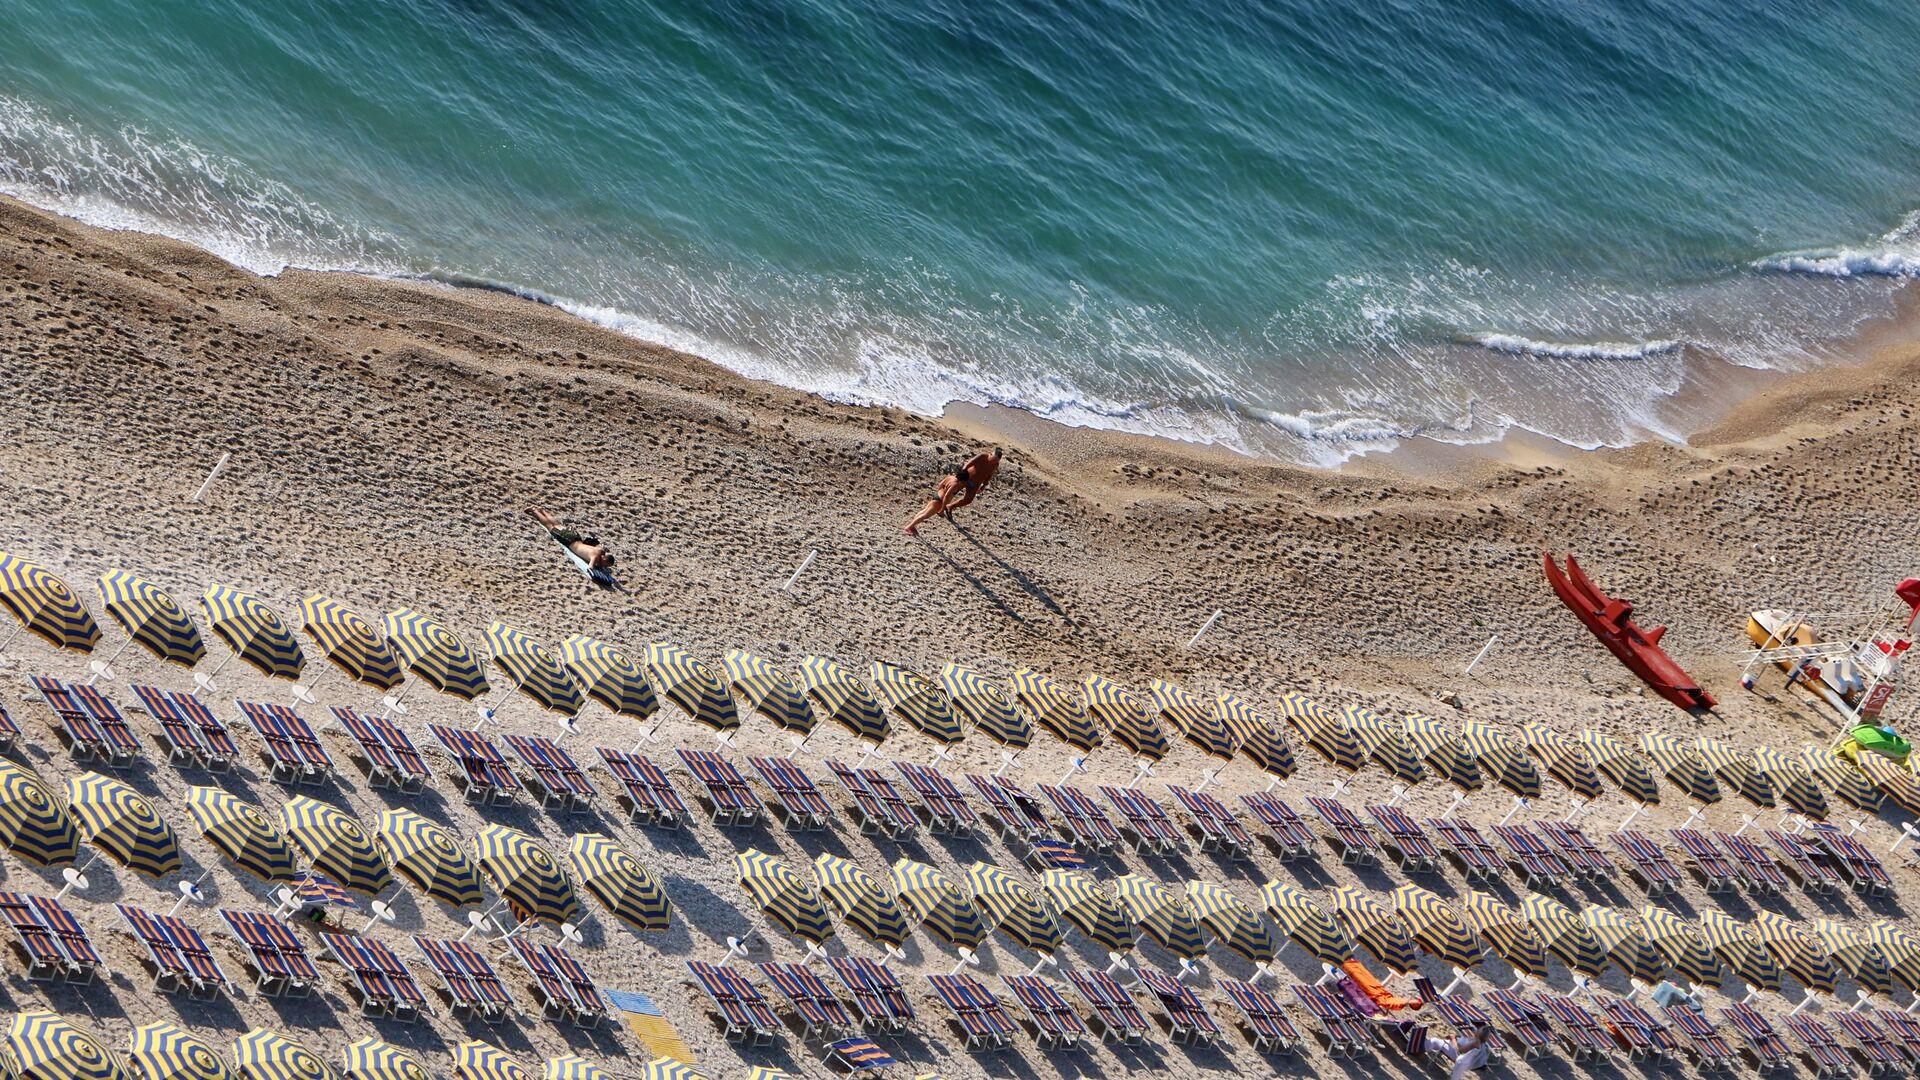 Una spiaggia quasi vuota - Sputnik Italia, 1920, 20.05.2021